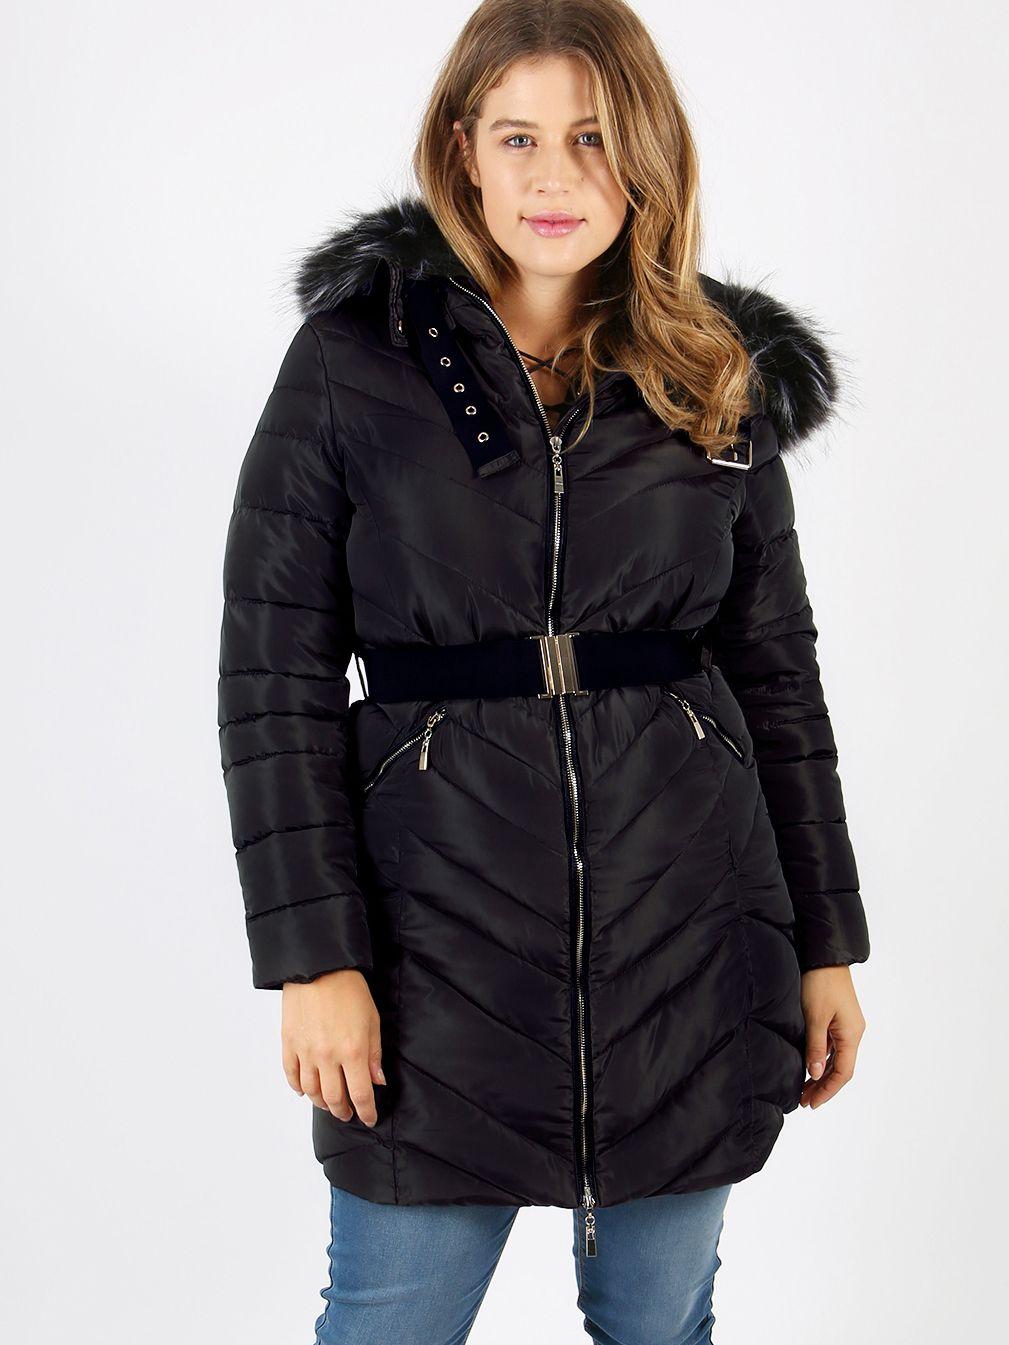 44a1bc0b913 Lovedrobe Black Long Jacket With Fur Trim